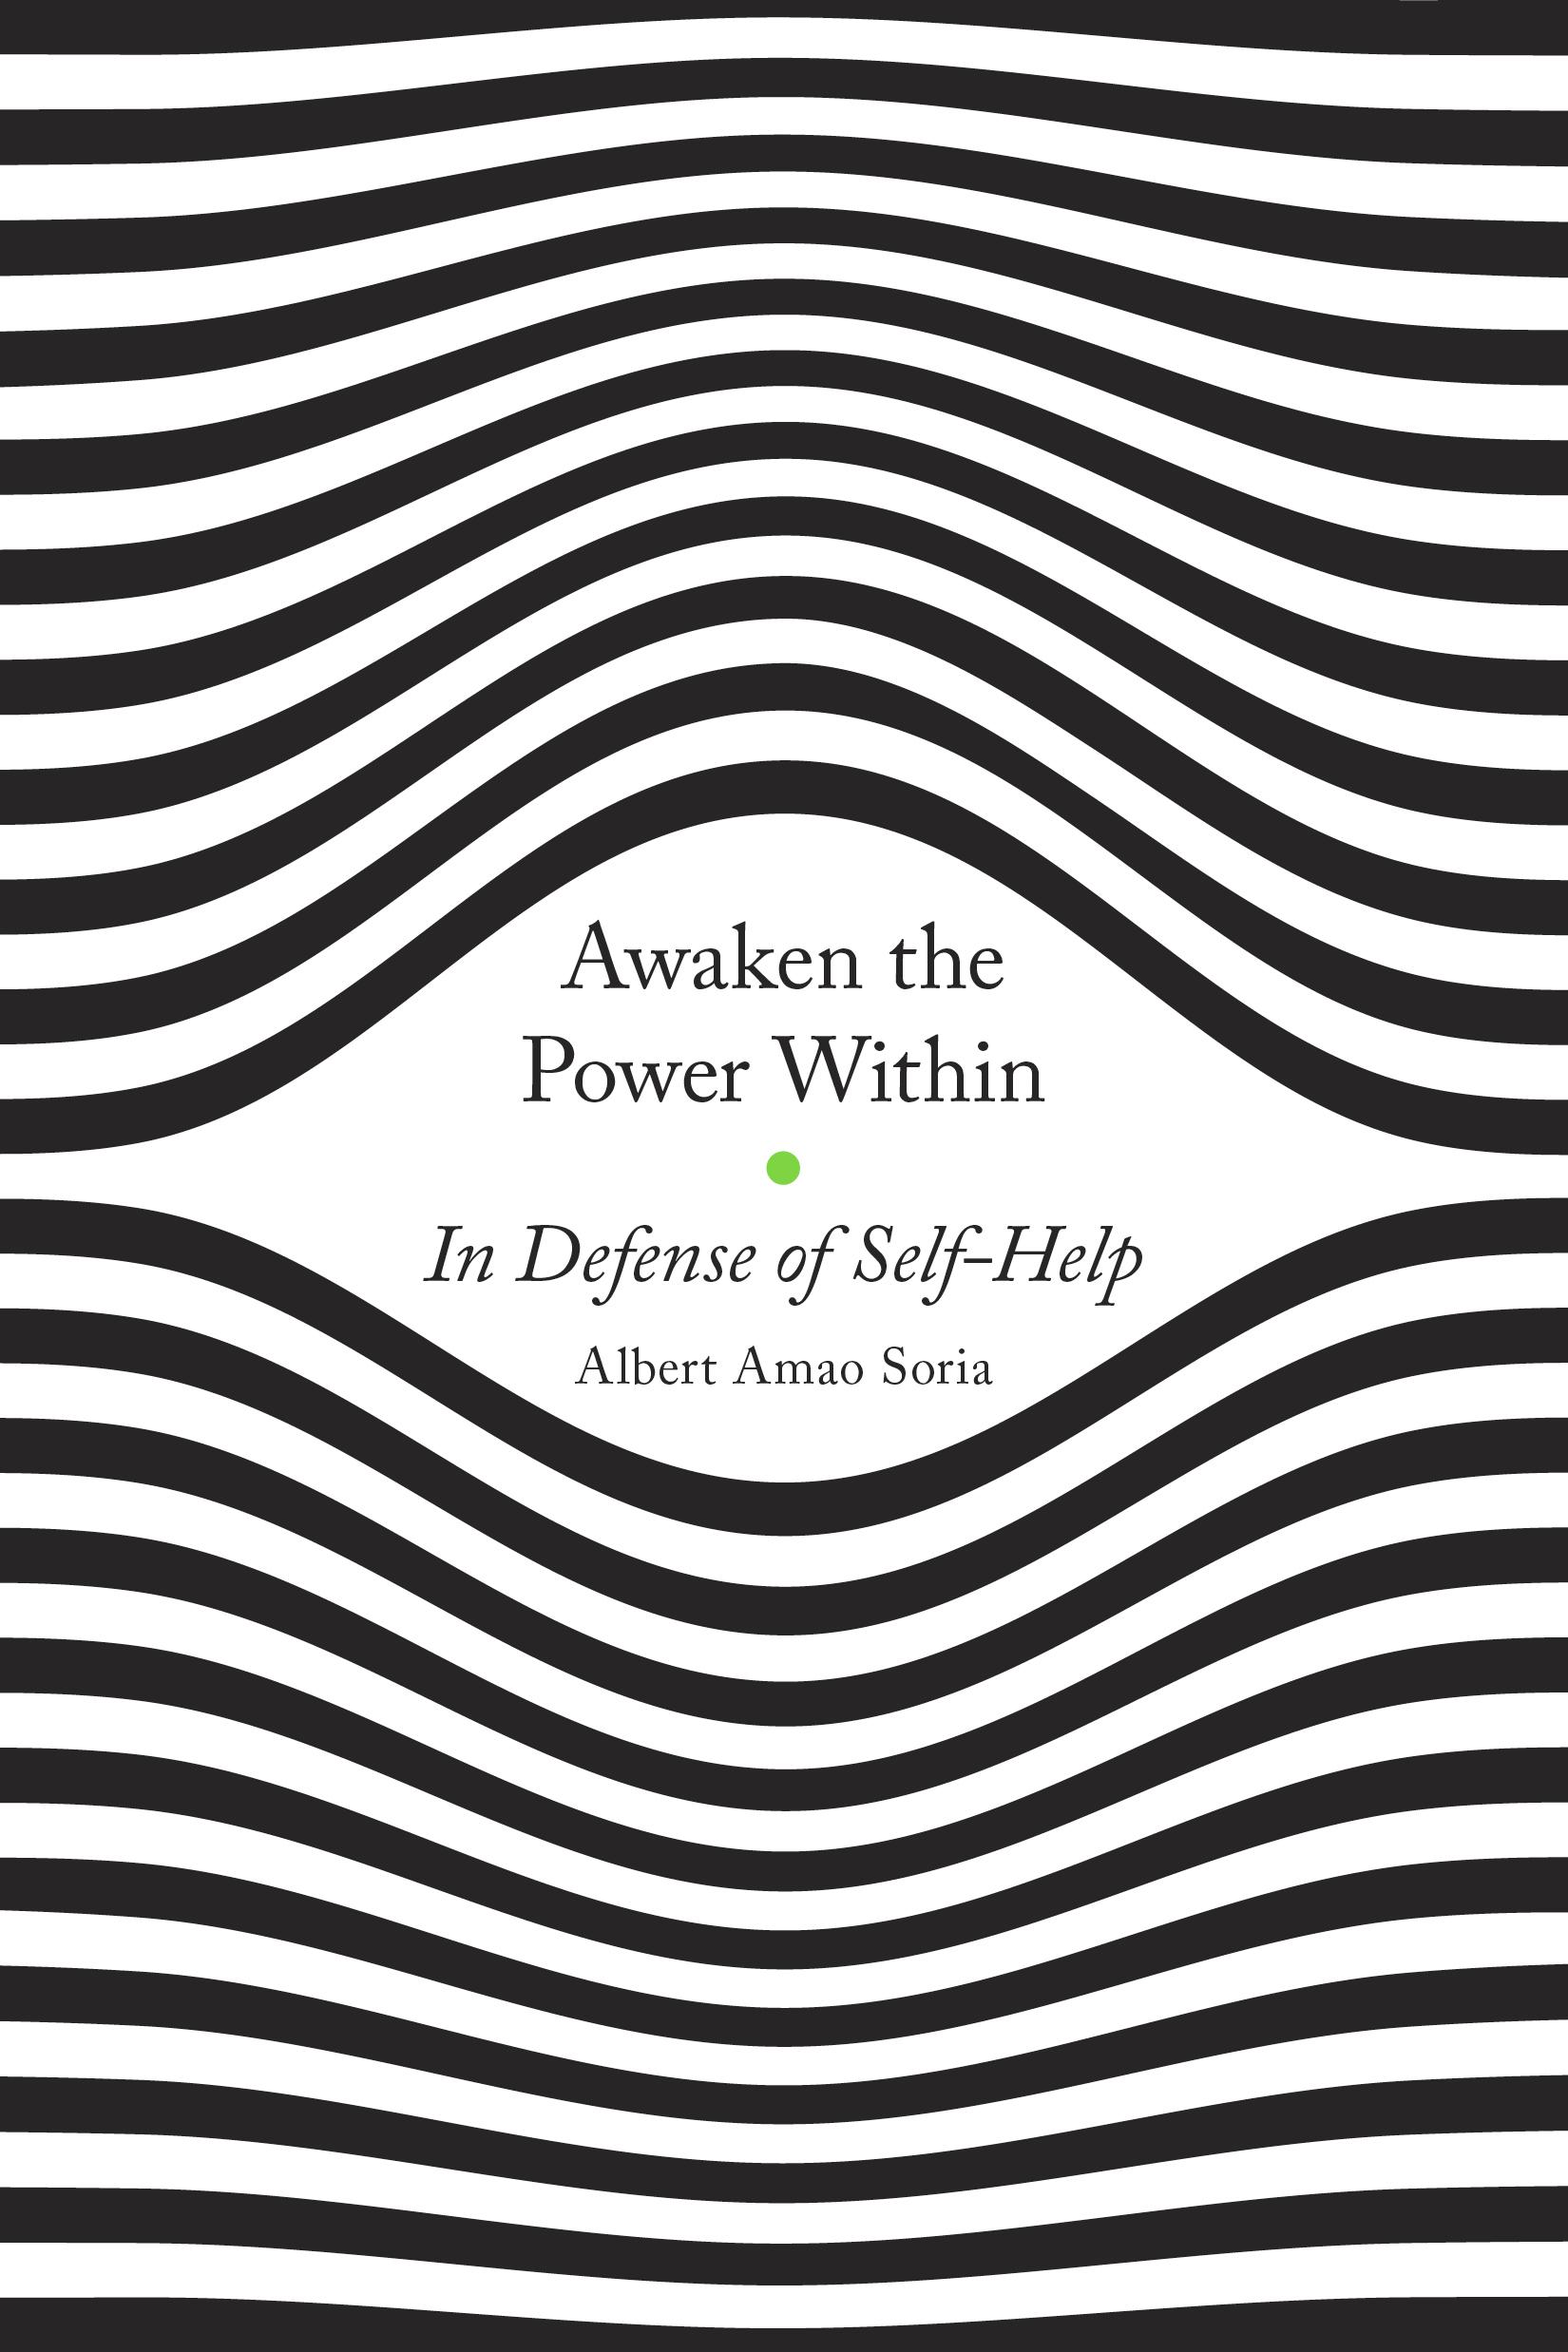 Awaken the Power Within